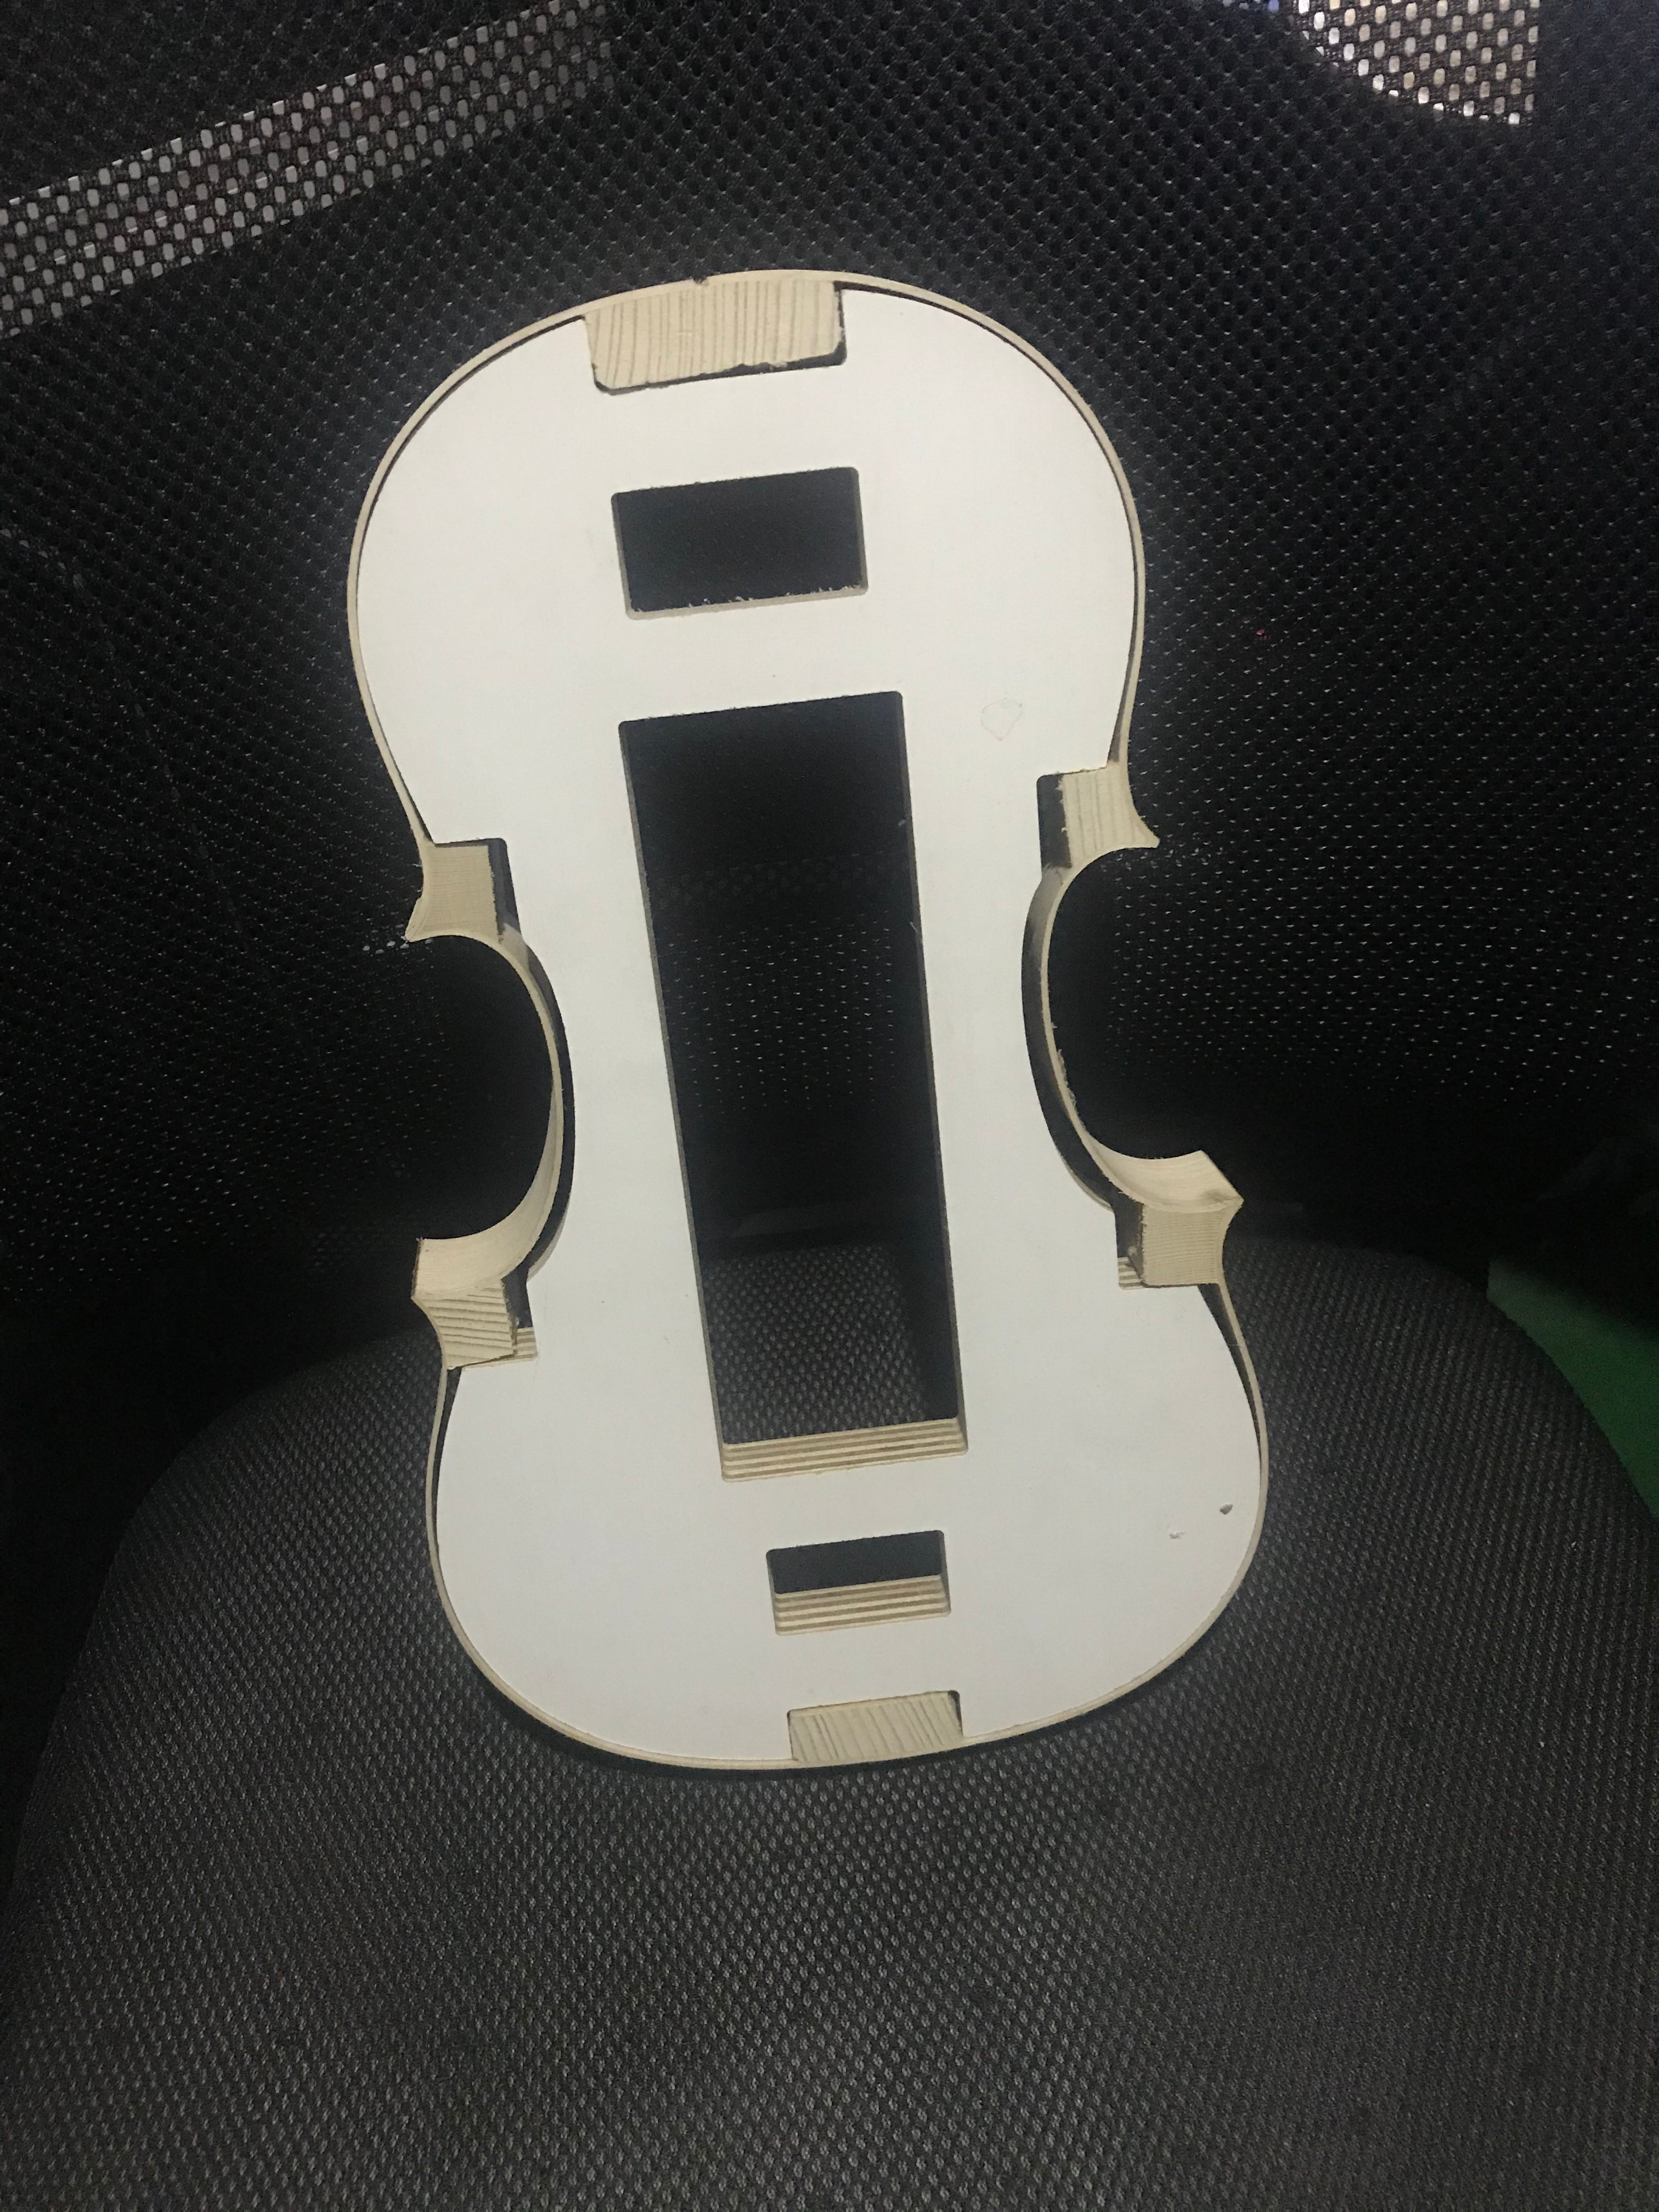 1 Pcs 4/4 Violin Templet Mold Neck / F Hole Templet Violin Making Tool For Luthier enlarge